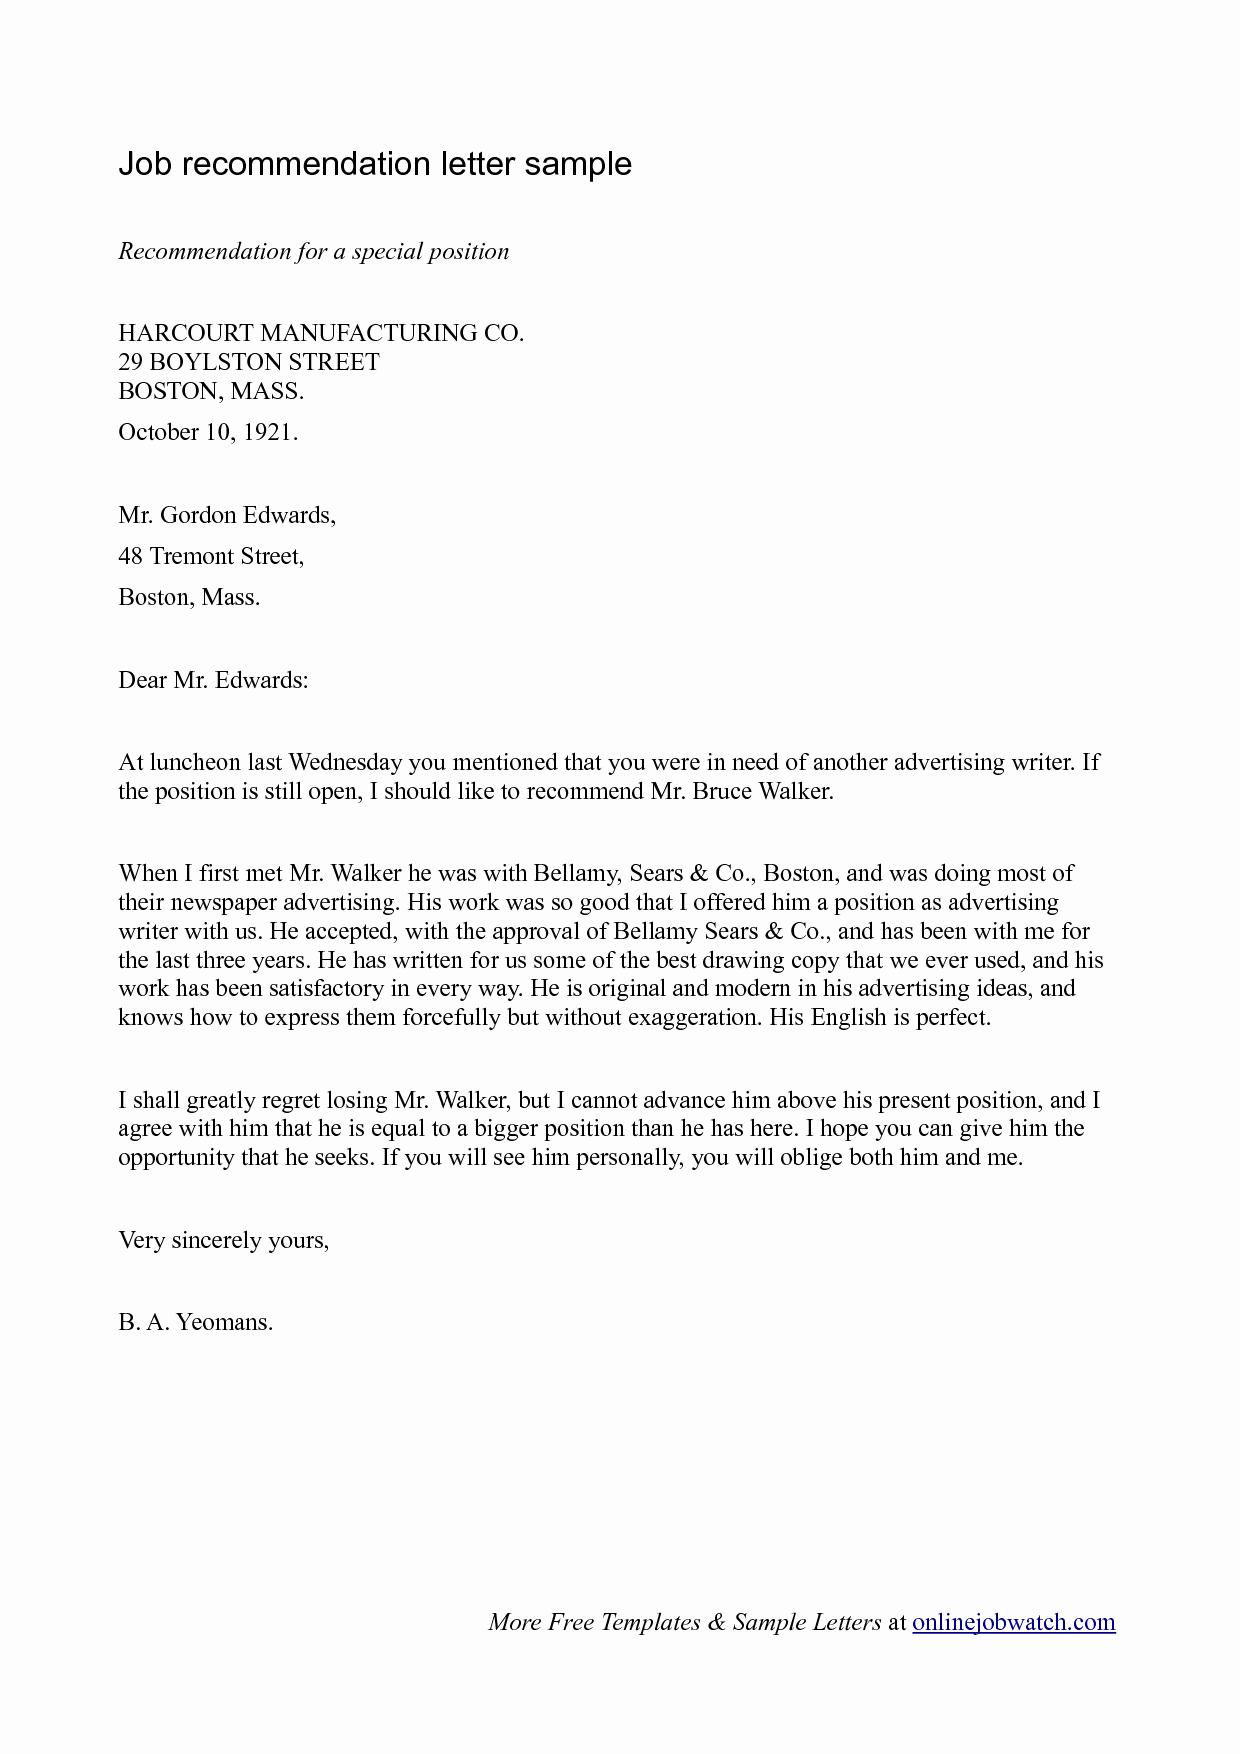 Recommendation Letter for Job Template Best Of Job Re Mendation Letter